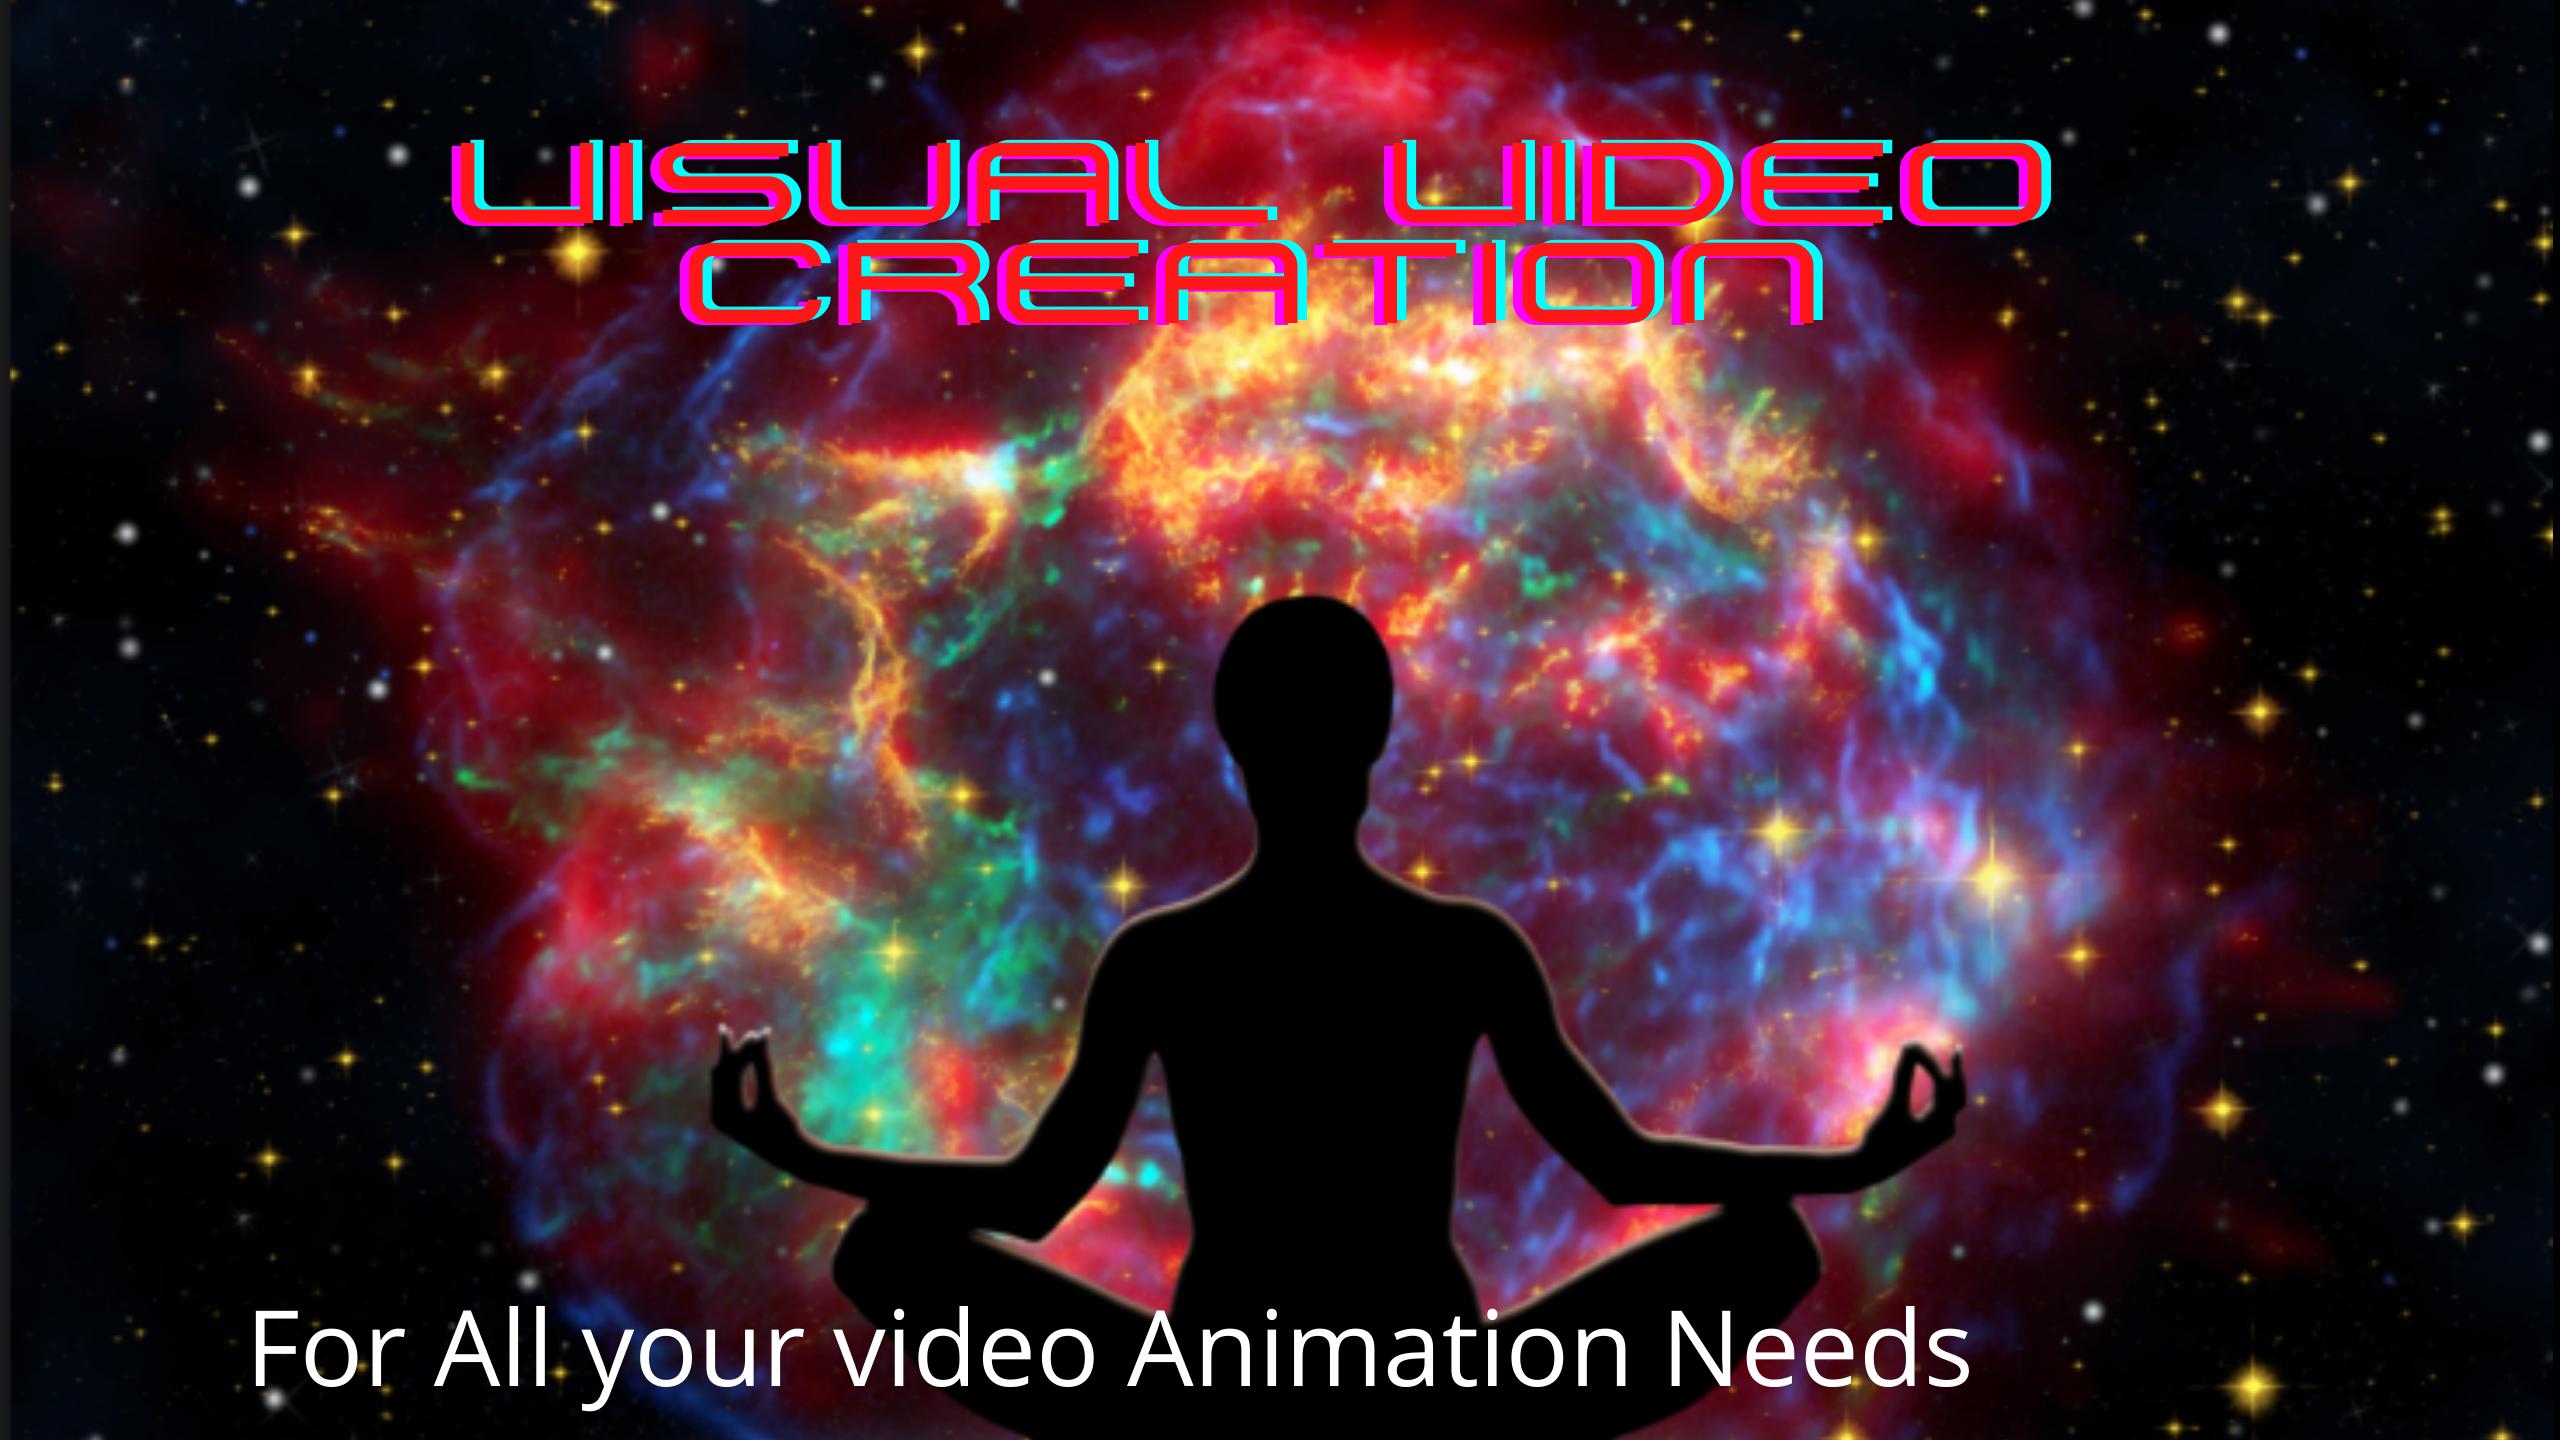 Maaster Video Creation